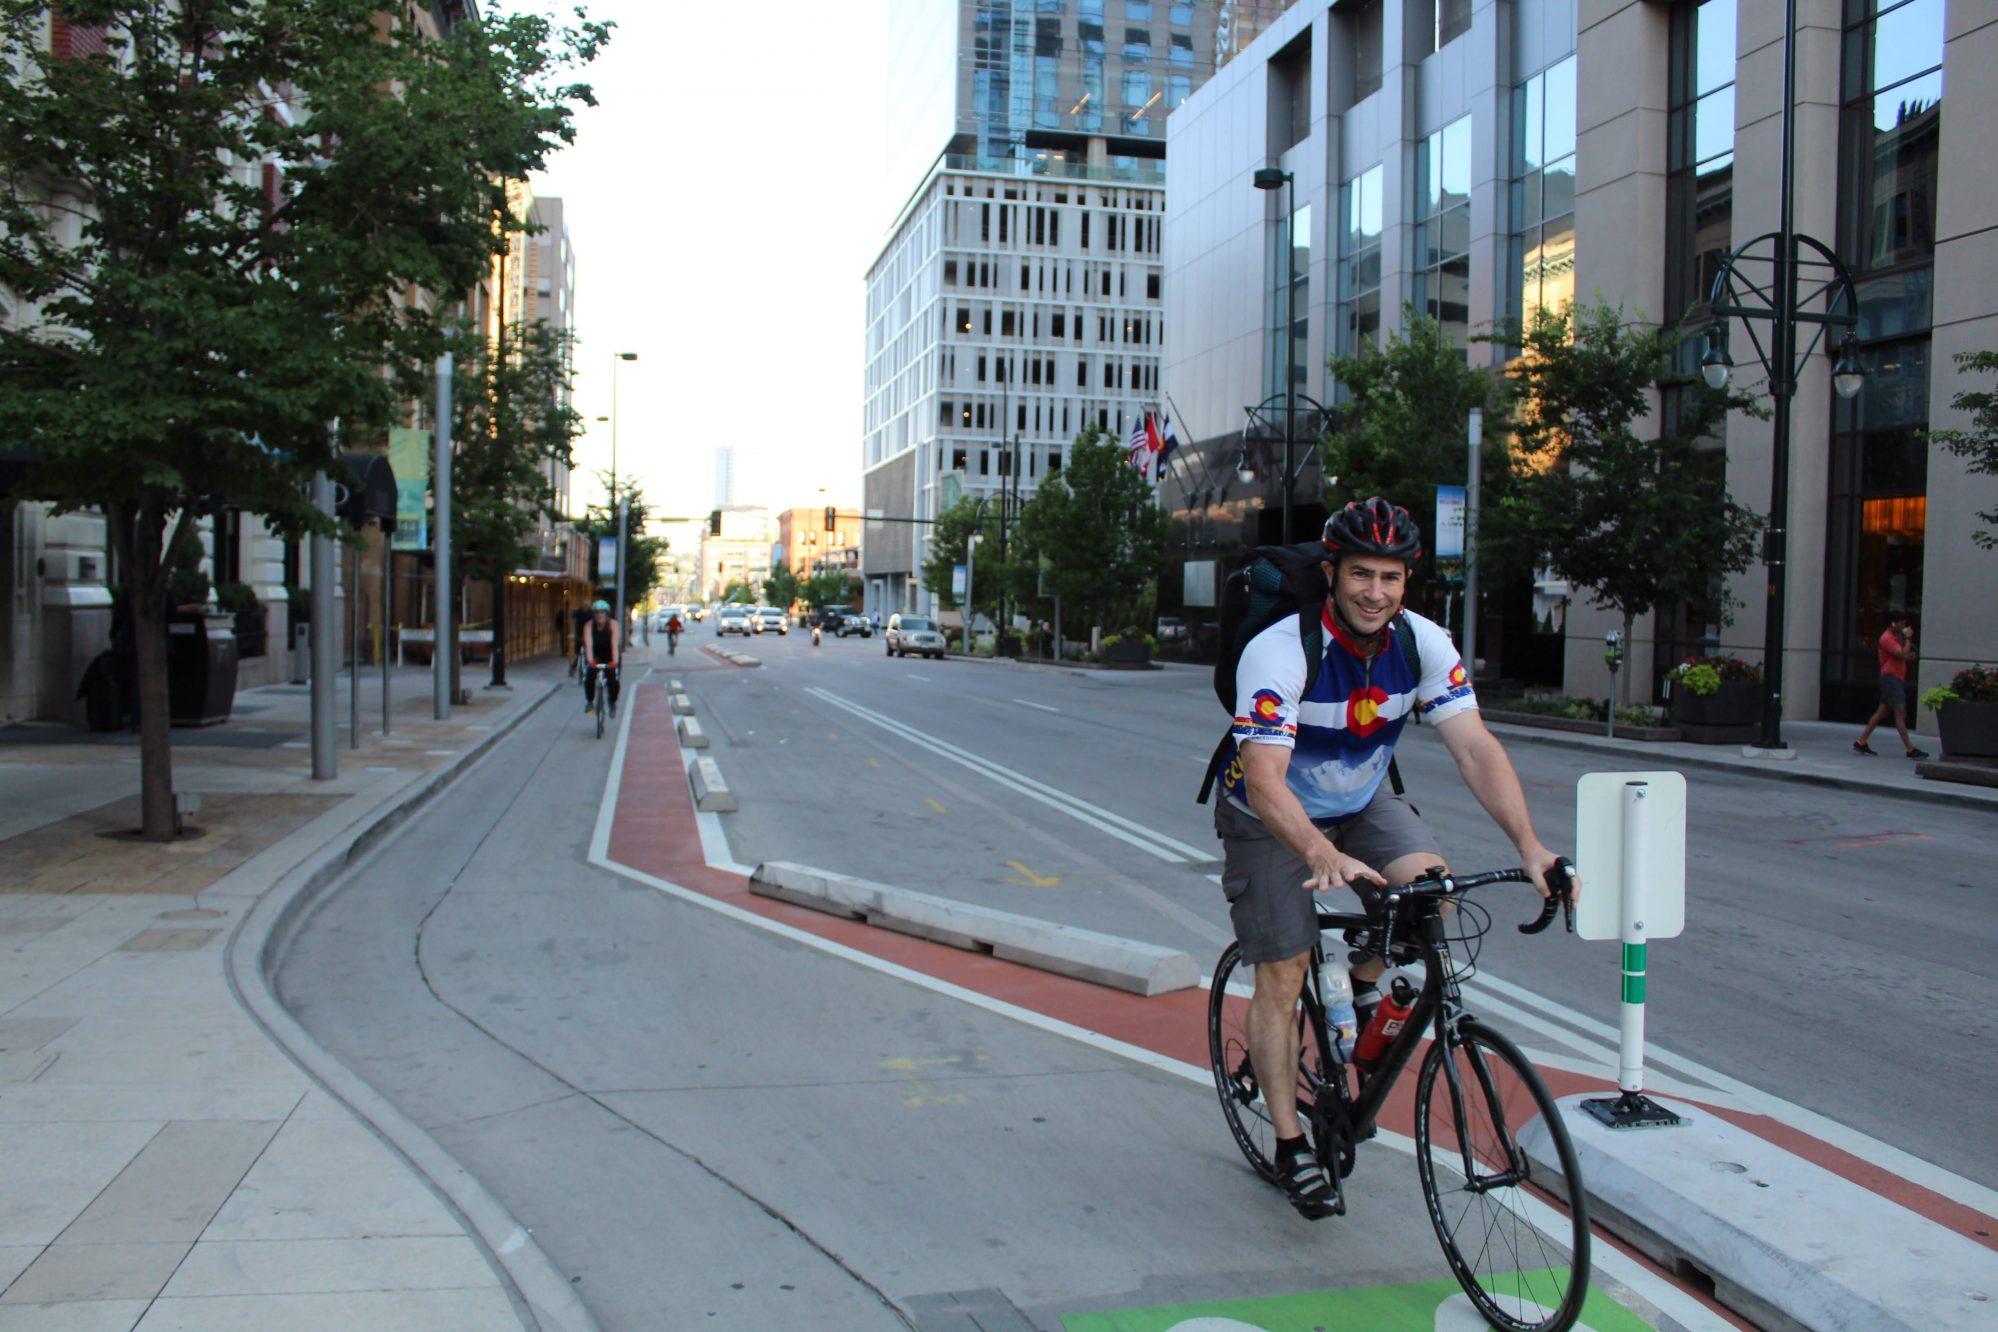 Bike to Work Day Downtown Denver Biking Bicyclist 14th Street Bike Lane